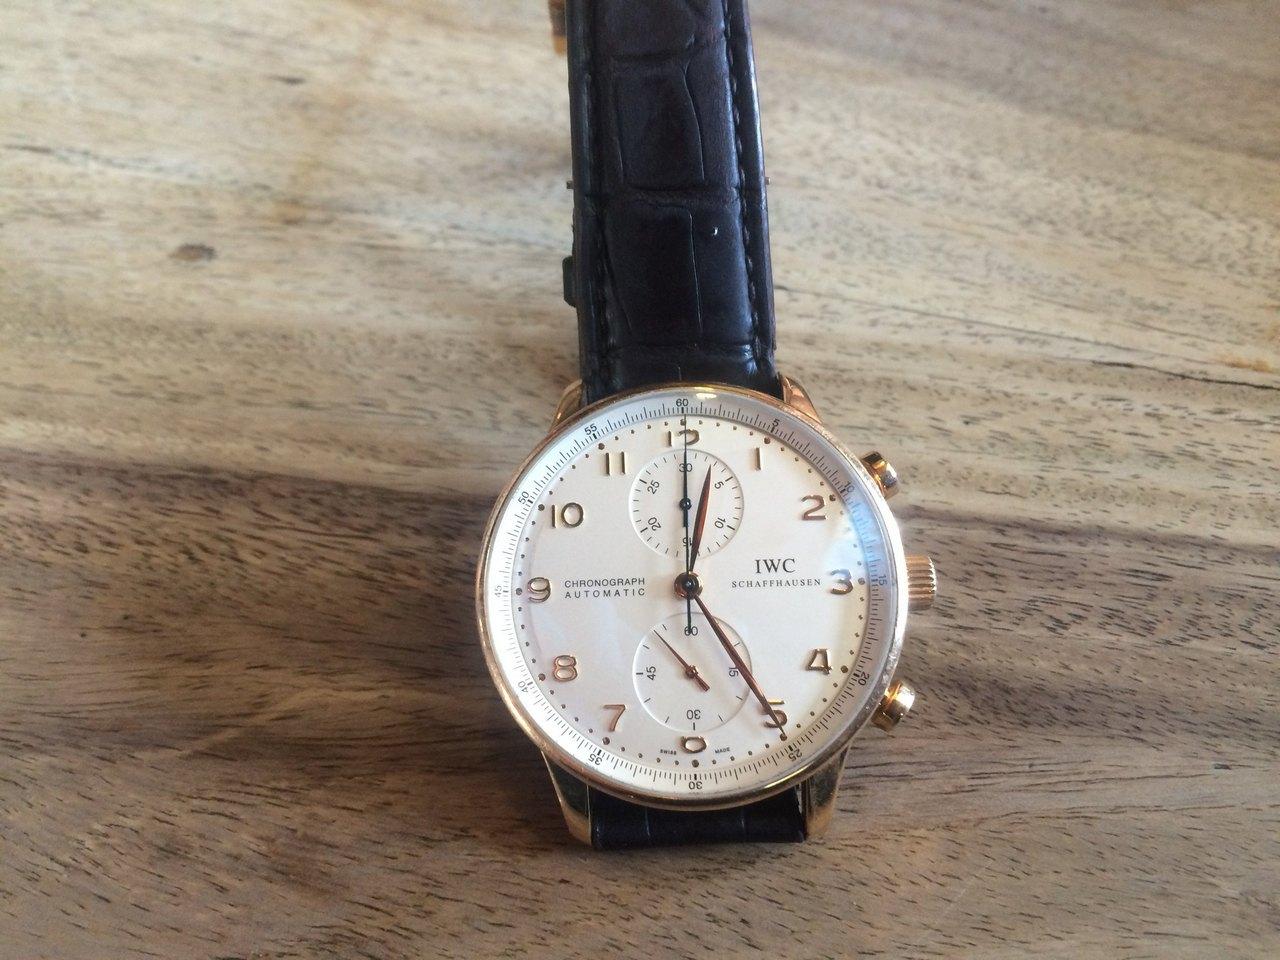 IWC Schaffhausen Chronograph Automatic Verloren